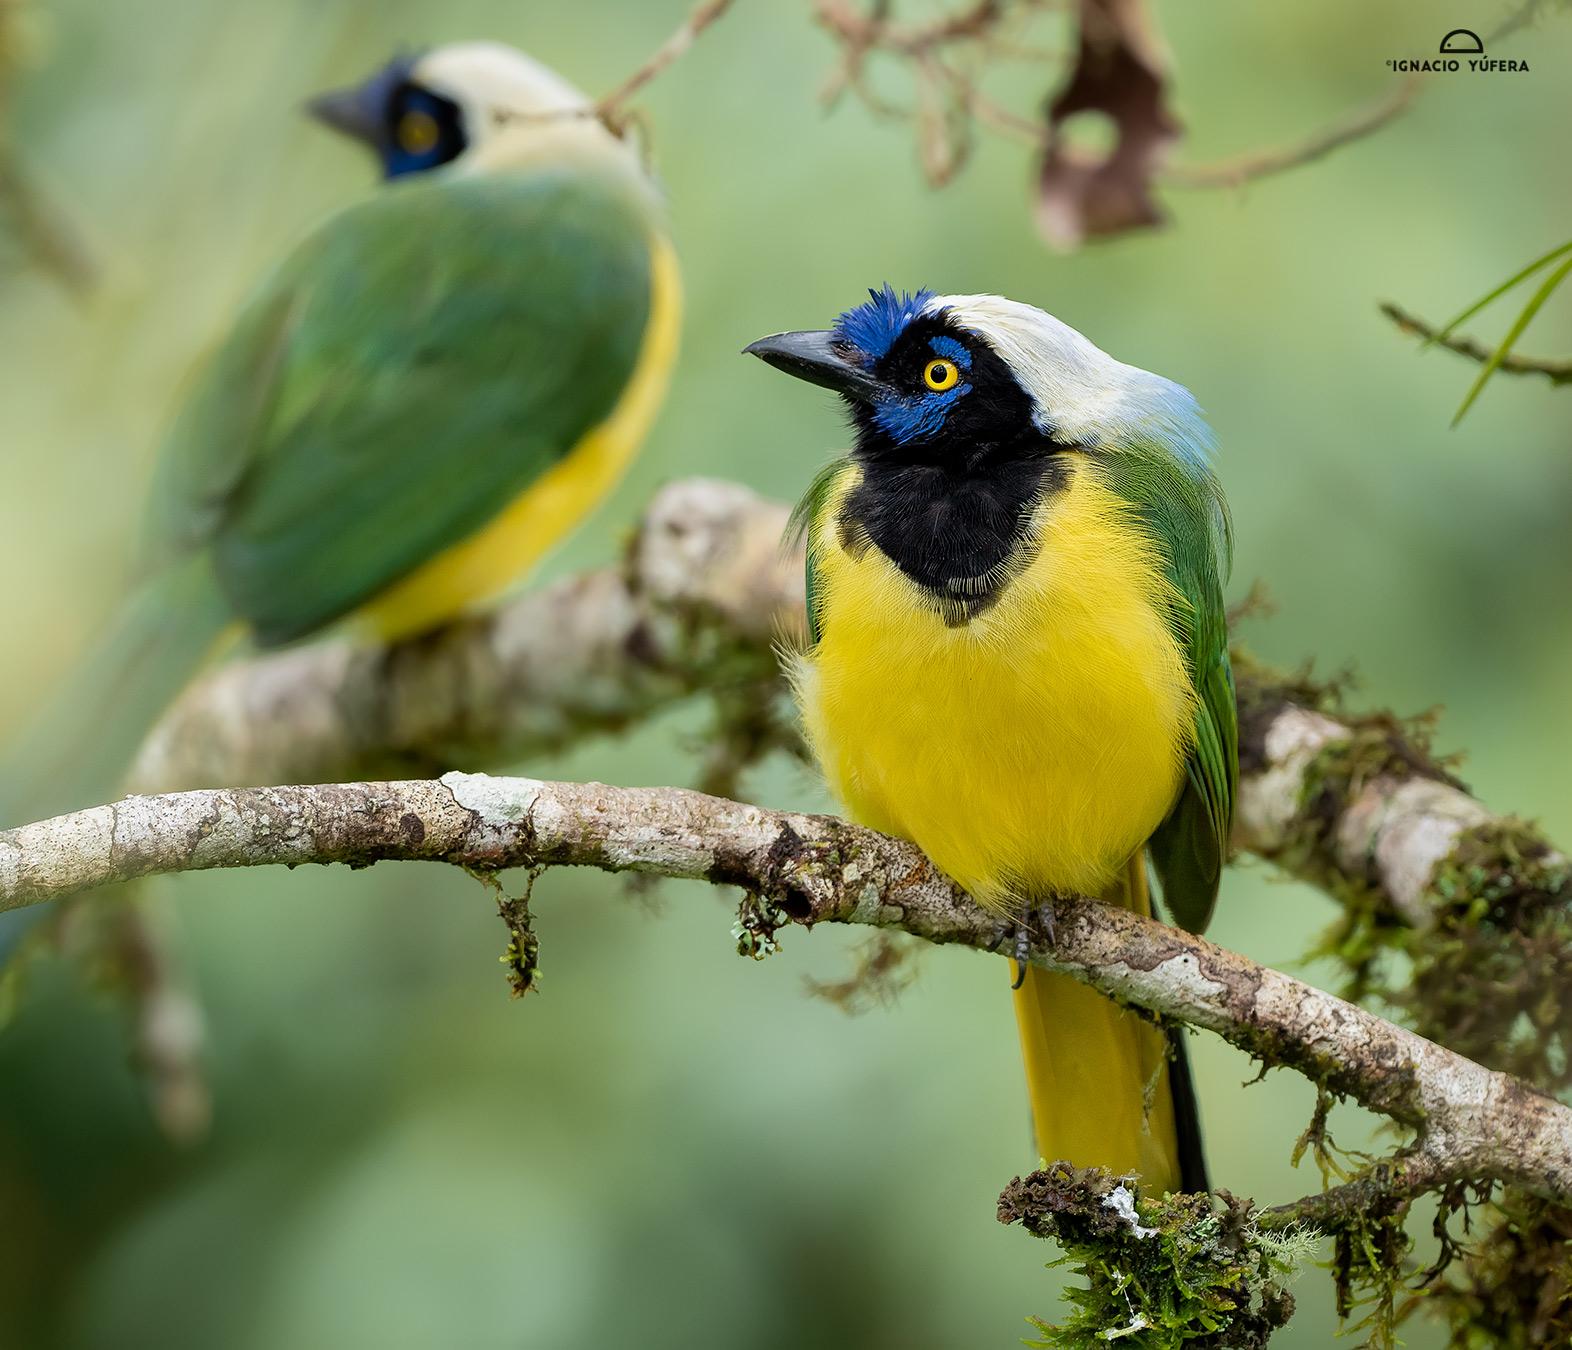 Inca Jay (Cyanocorax yncas), Cosanga, Ecuador